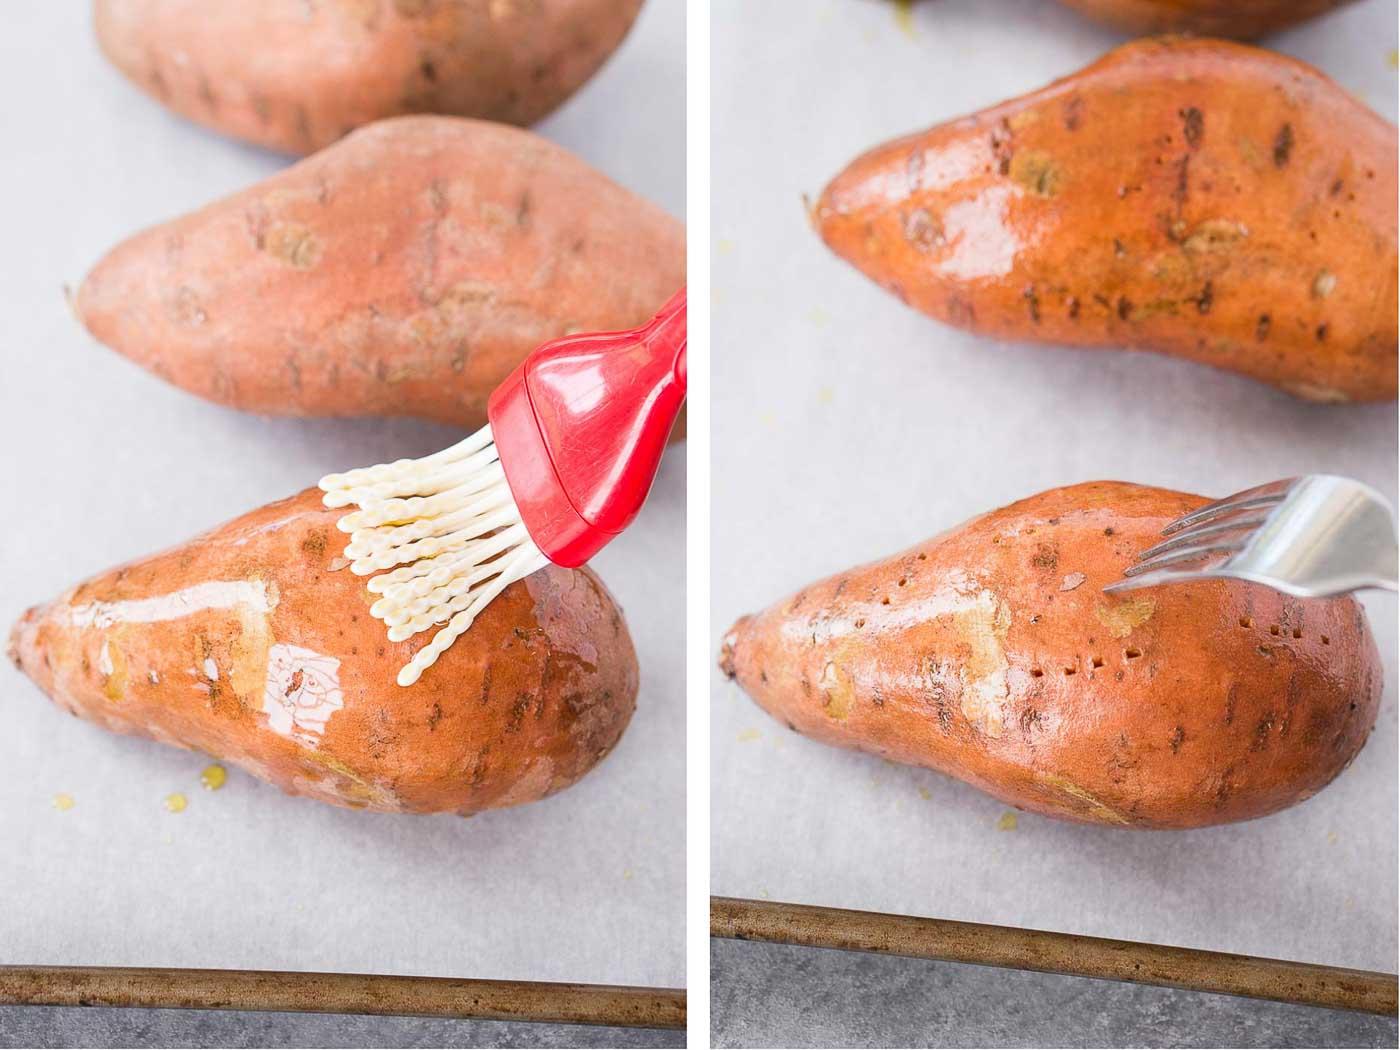 preparing sweet potatoes for baking